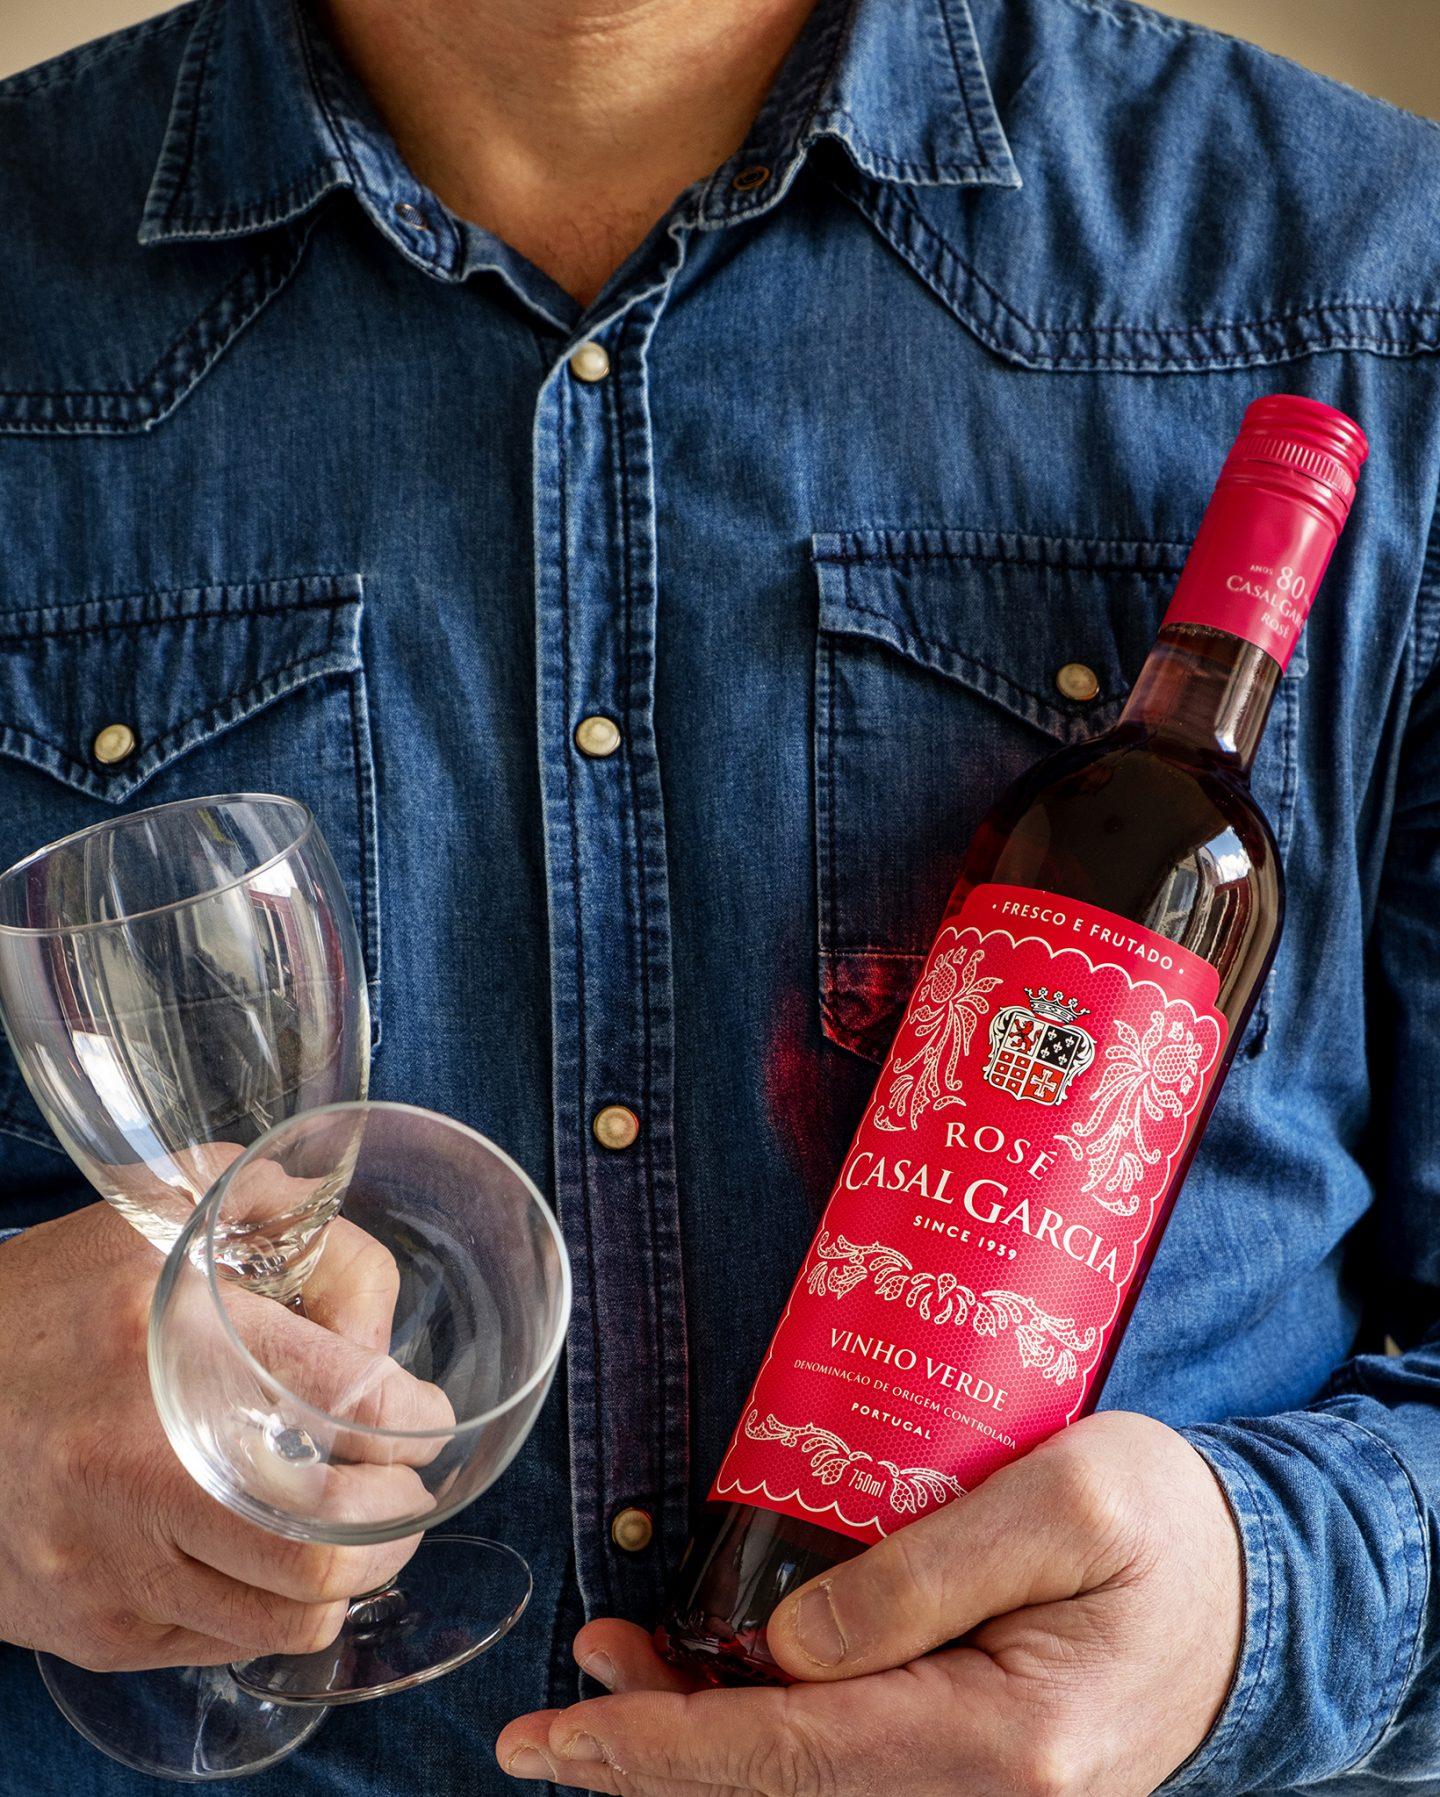 vinho verde rosé Casal Garcia